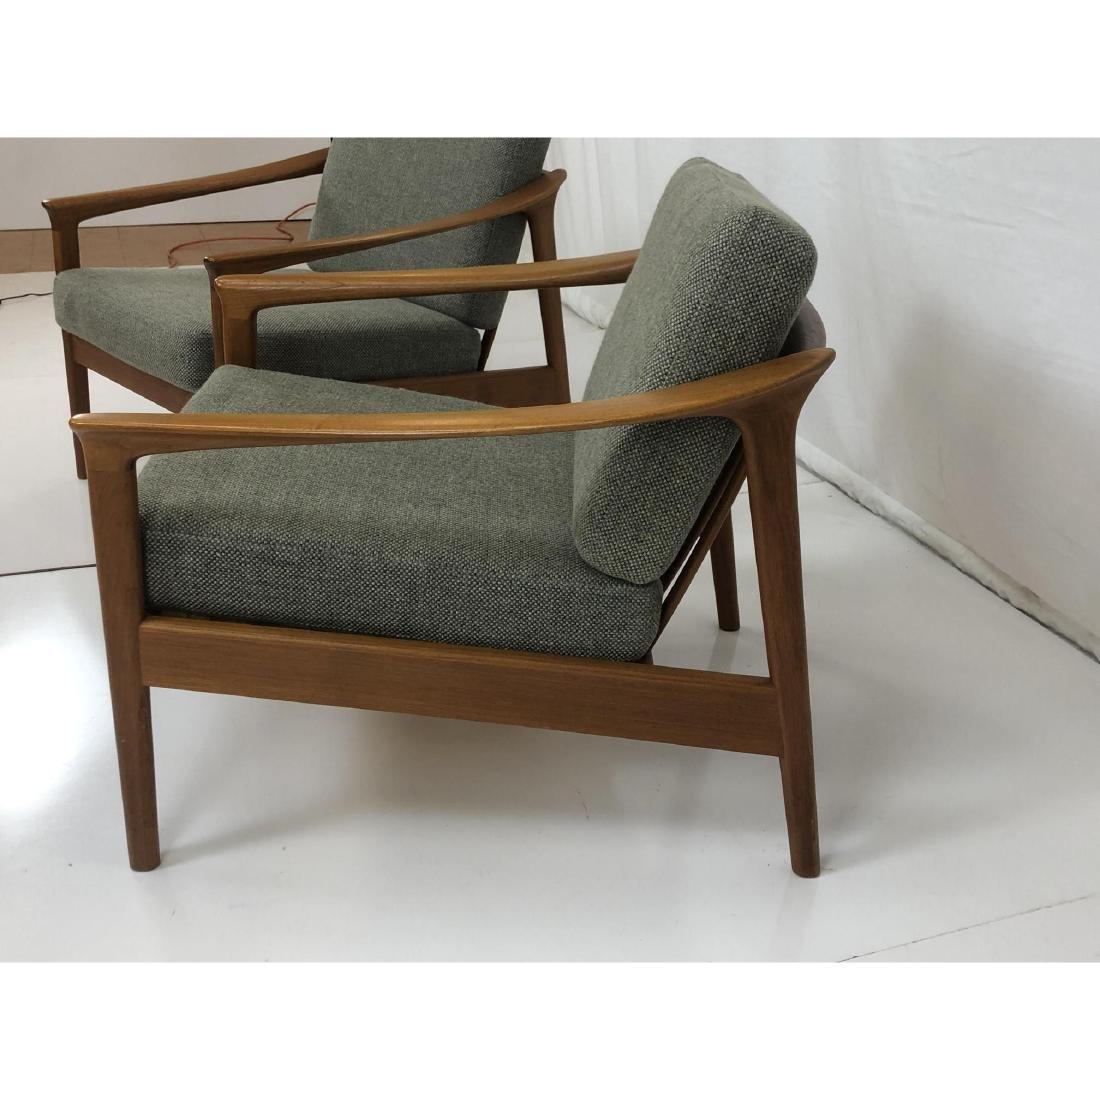 Pr FOLKE OHLSSON Danish Modern Teak Lounge Chairs - 5